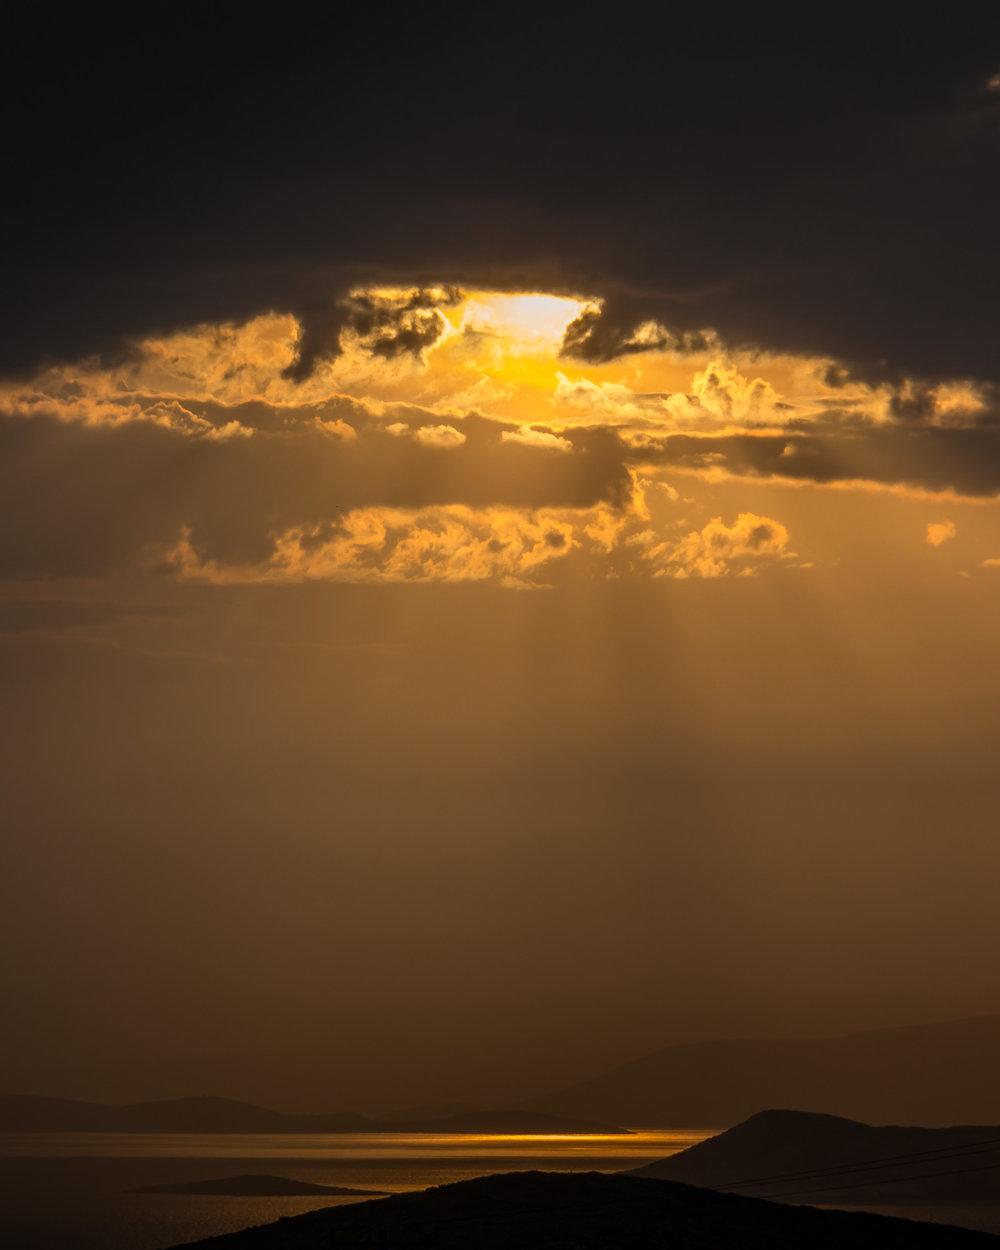 weather-in-amorgos-greece-06-stemajourneys.com.jpg